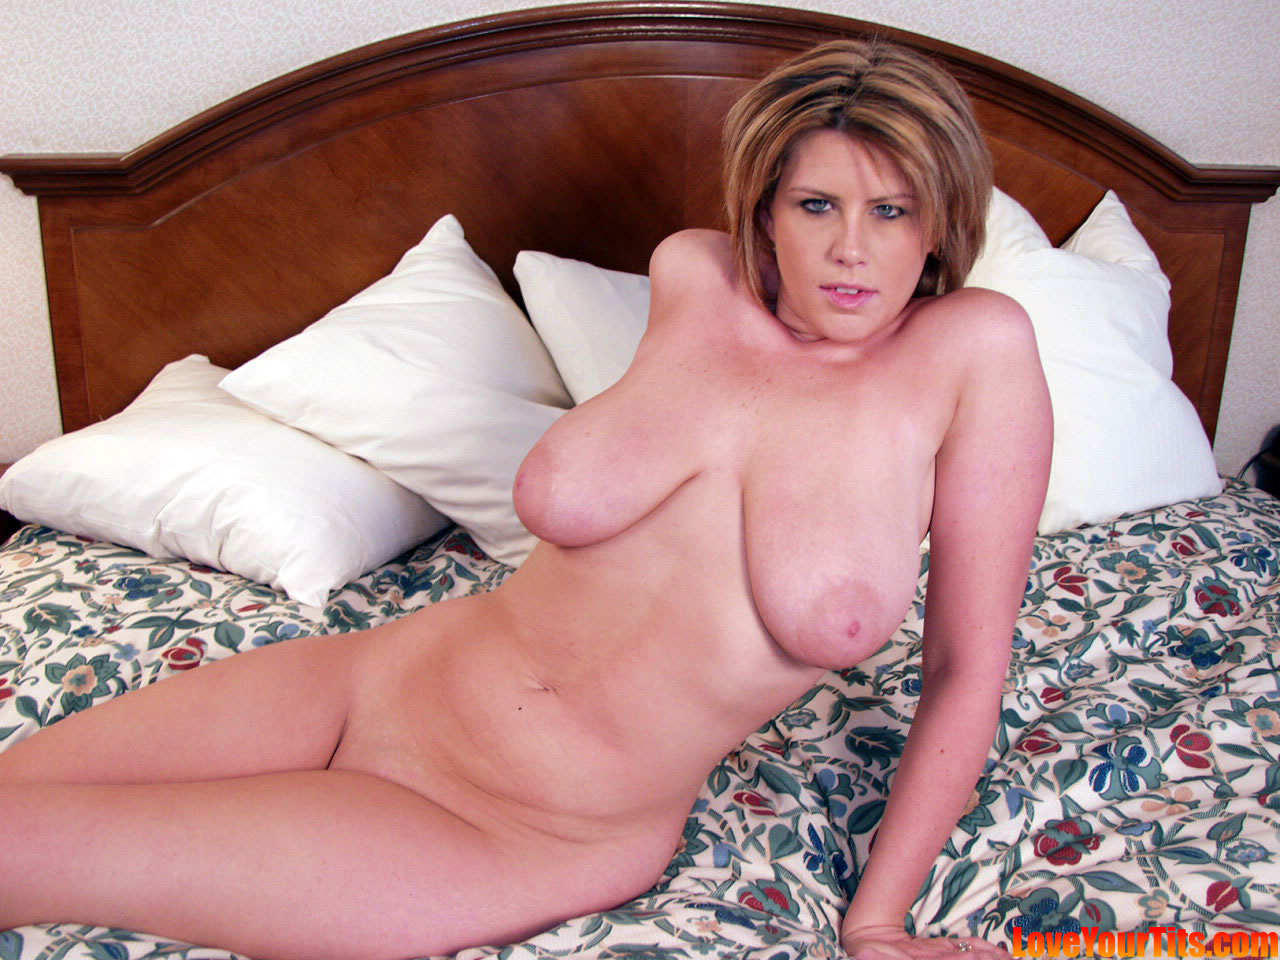 Rachael rays nude pics